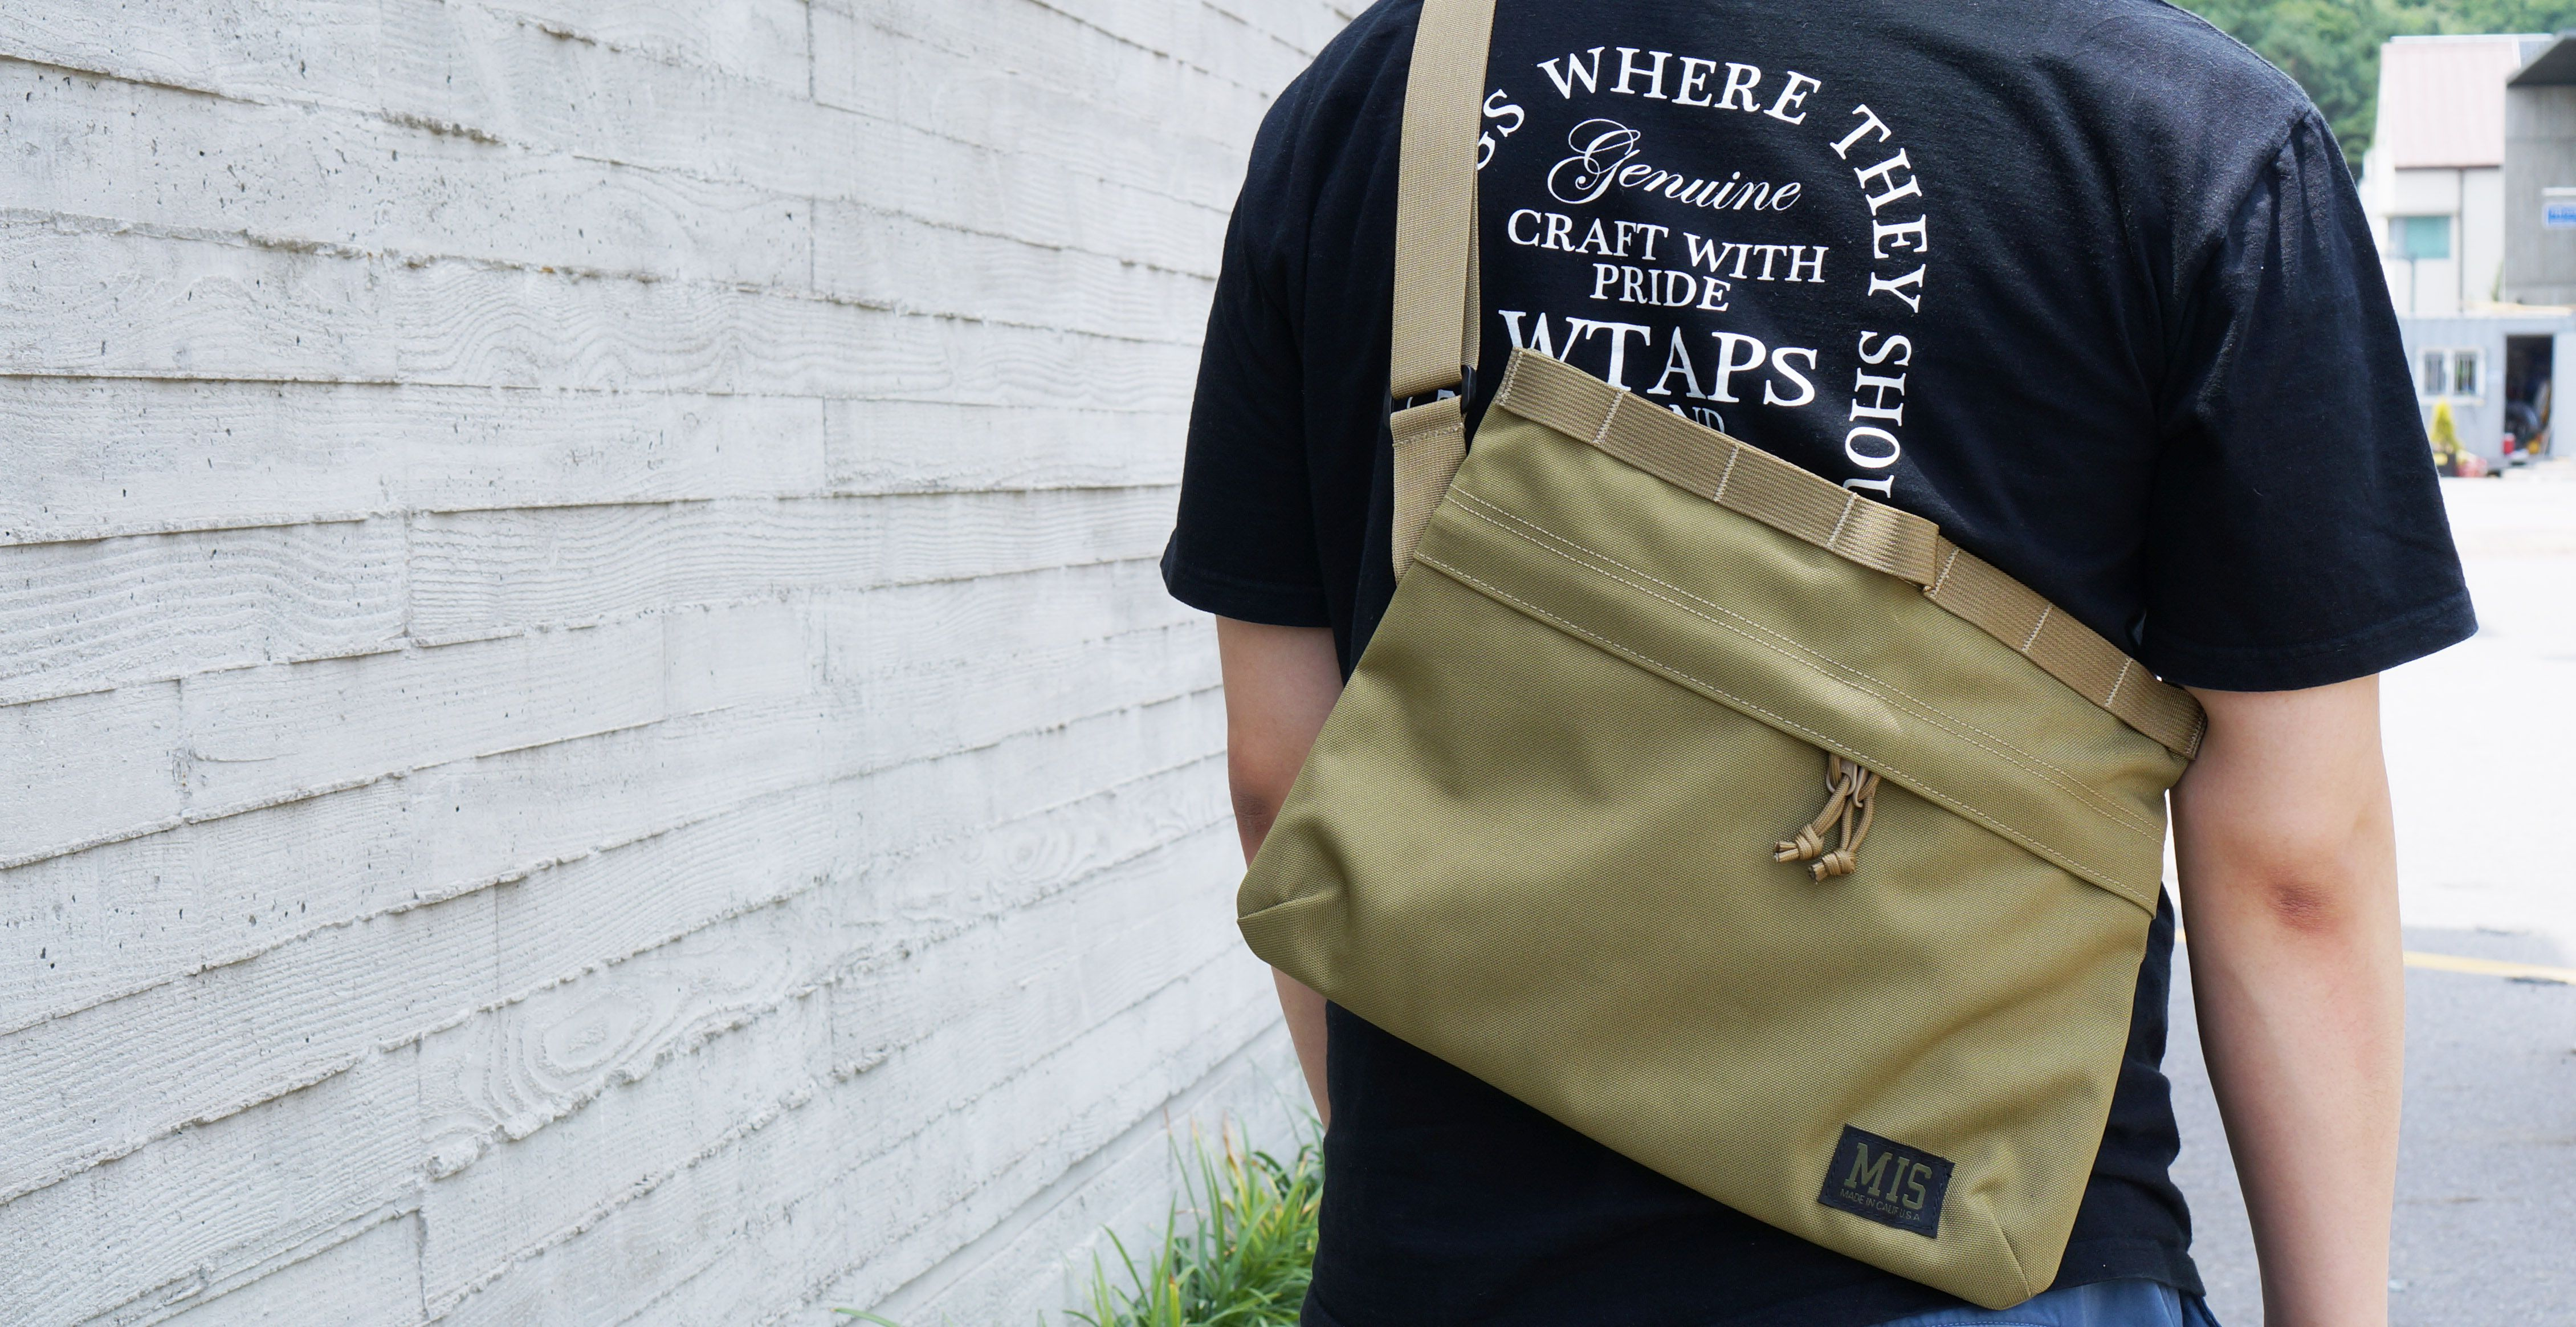 "MIS의 Padded Shoulder bag입니다. 13"" Macbook에 최적화되어 간편하게 착용하실 수 있는 제품입니다.  #mis #miscalif #milspec #madeinusa #camouflage #militarystandard #bag #가방"